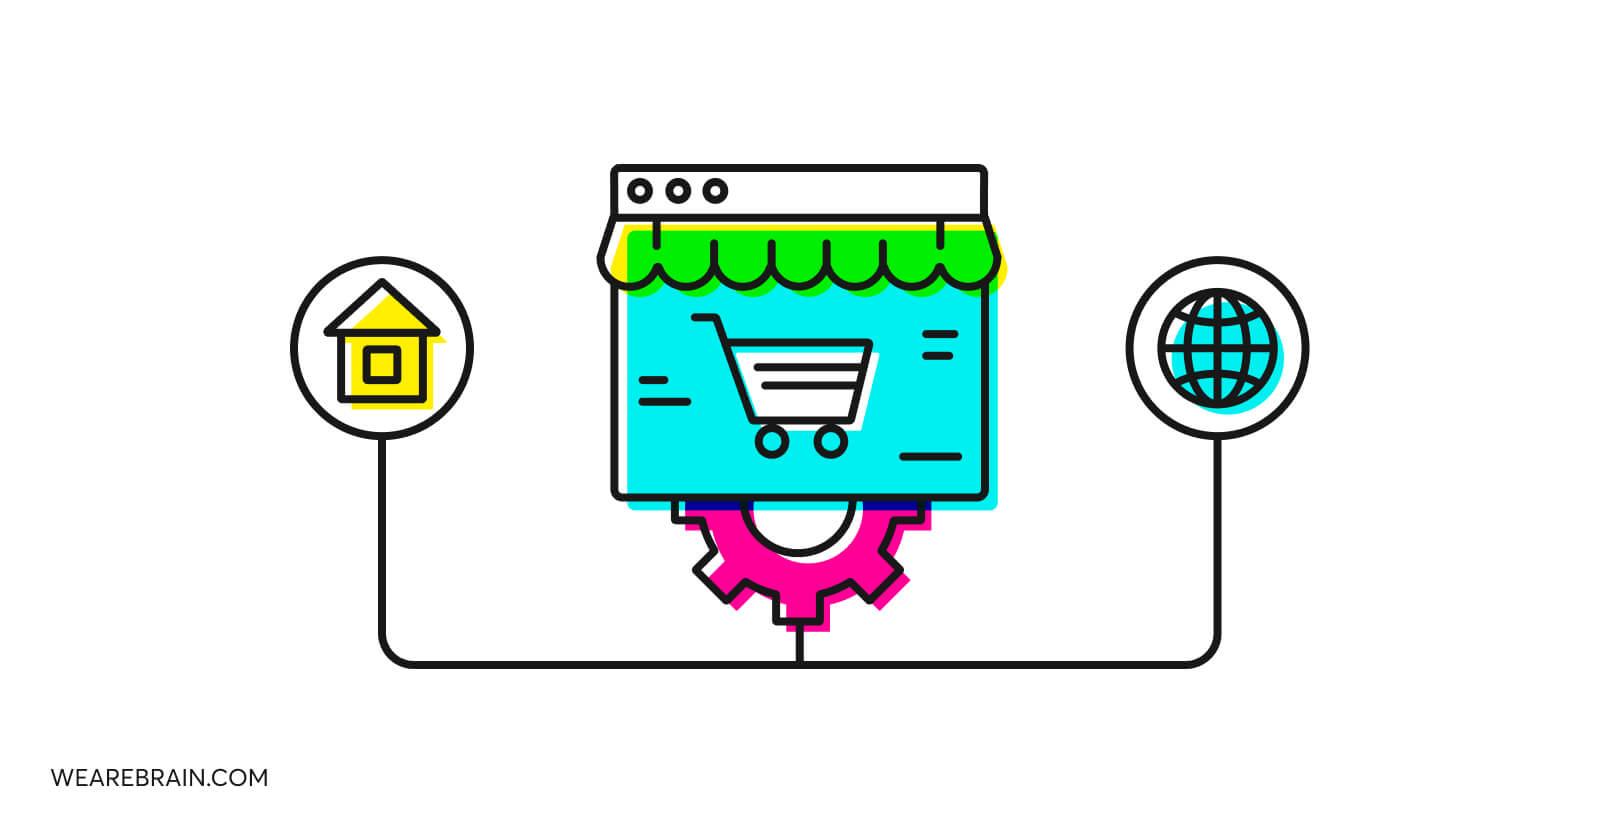 illustration about ecommerce development